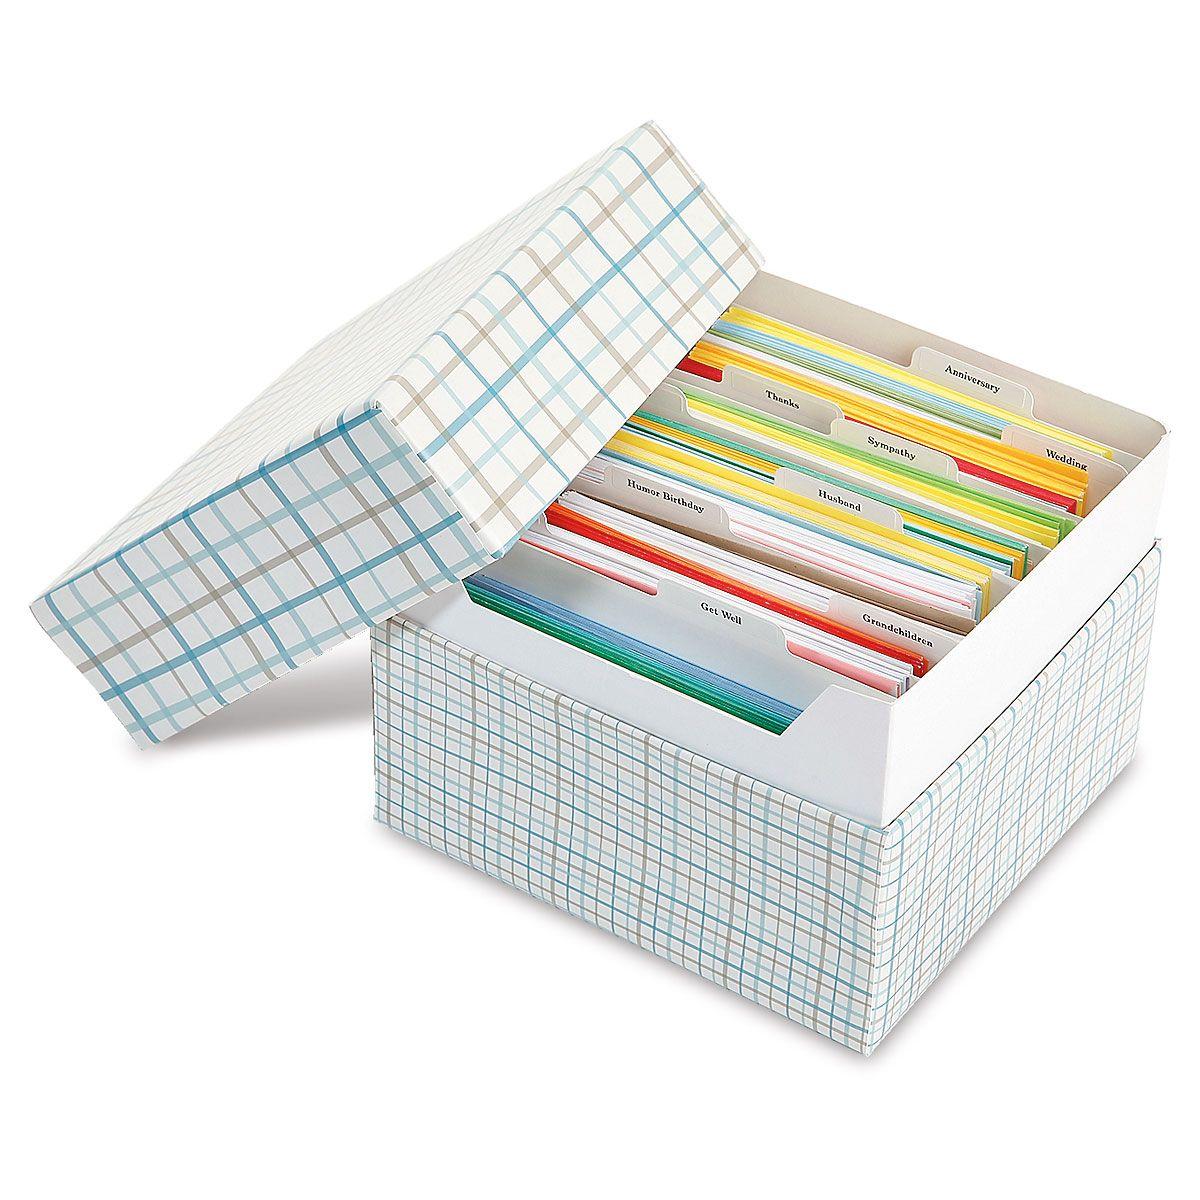 Stripes Greeting Card Organizer Box